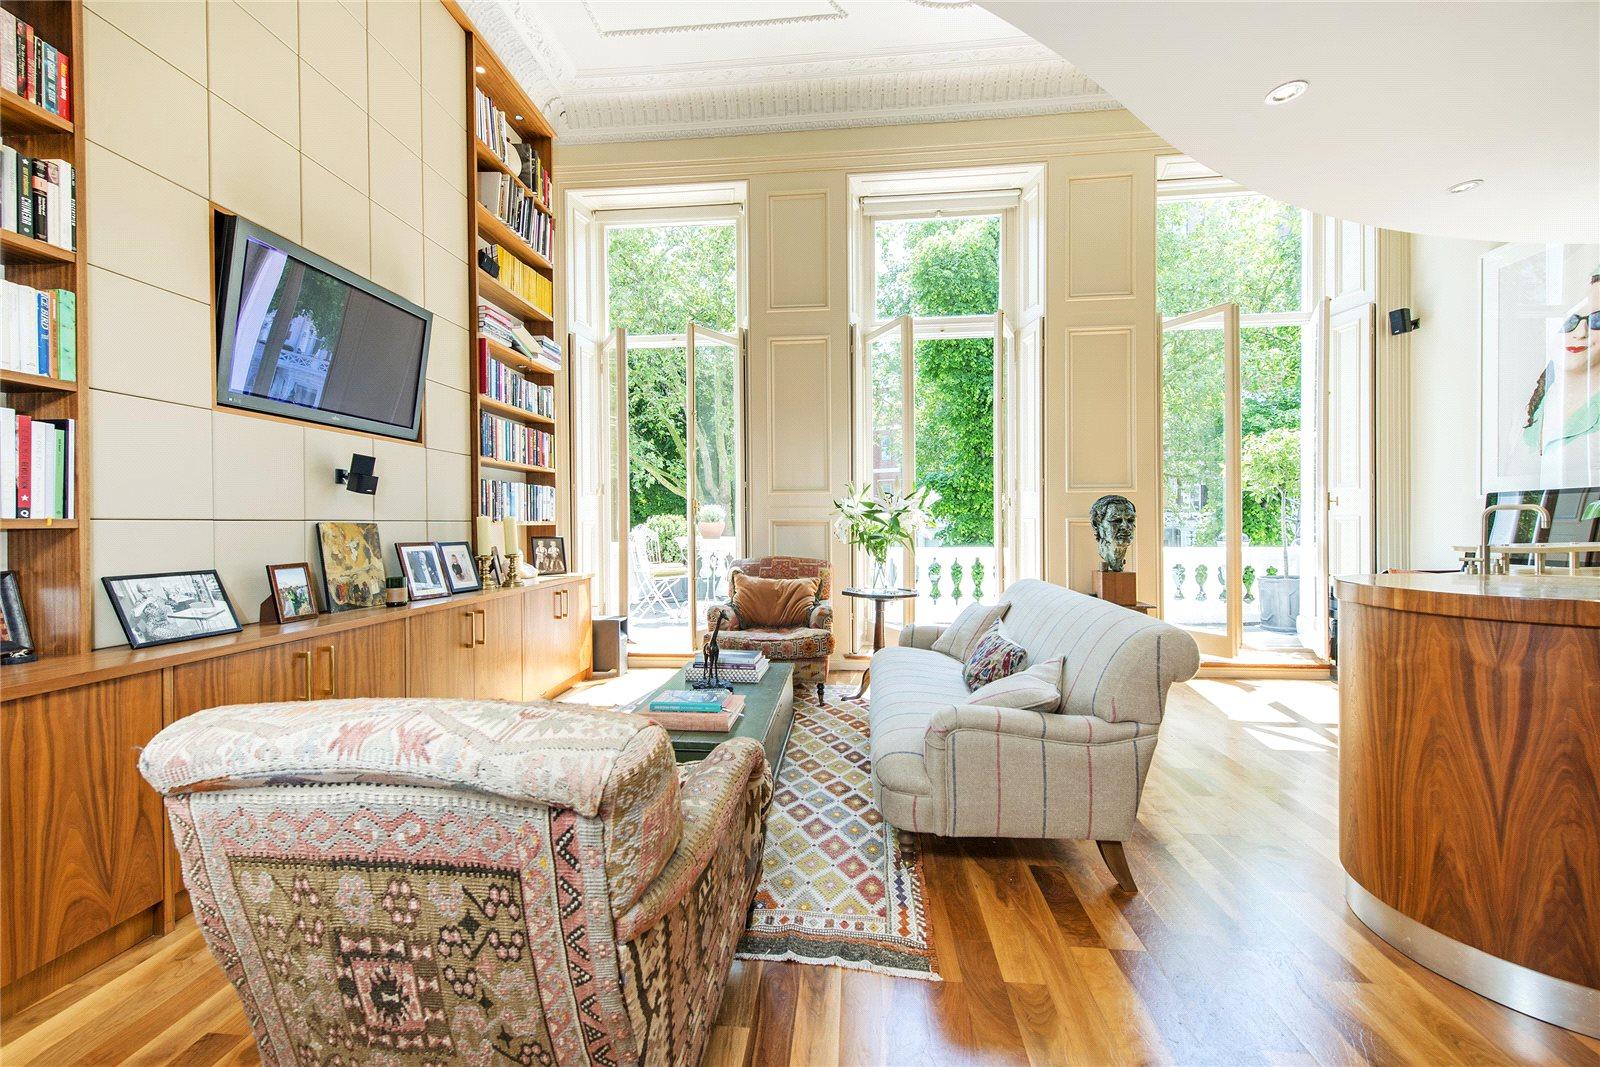 公寓 為 出售 在 Emperors Gate, South Kensington, London, SW7 South Kensington, London, 英格蘭